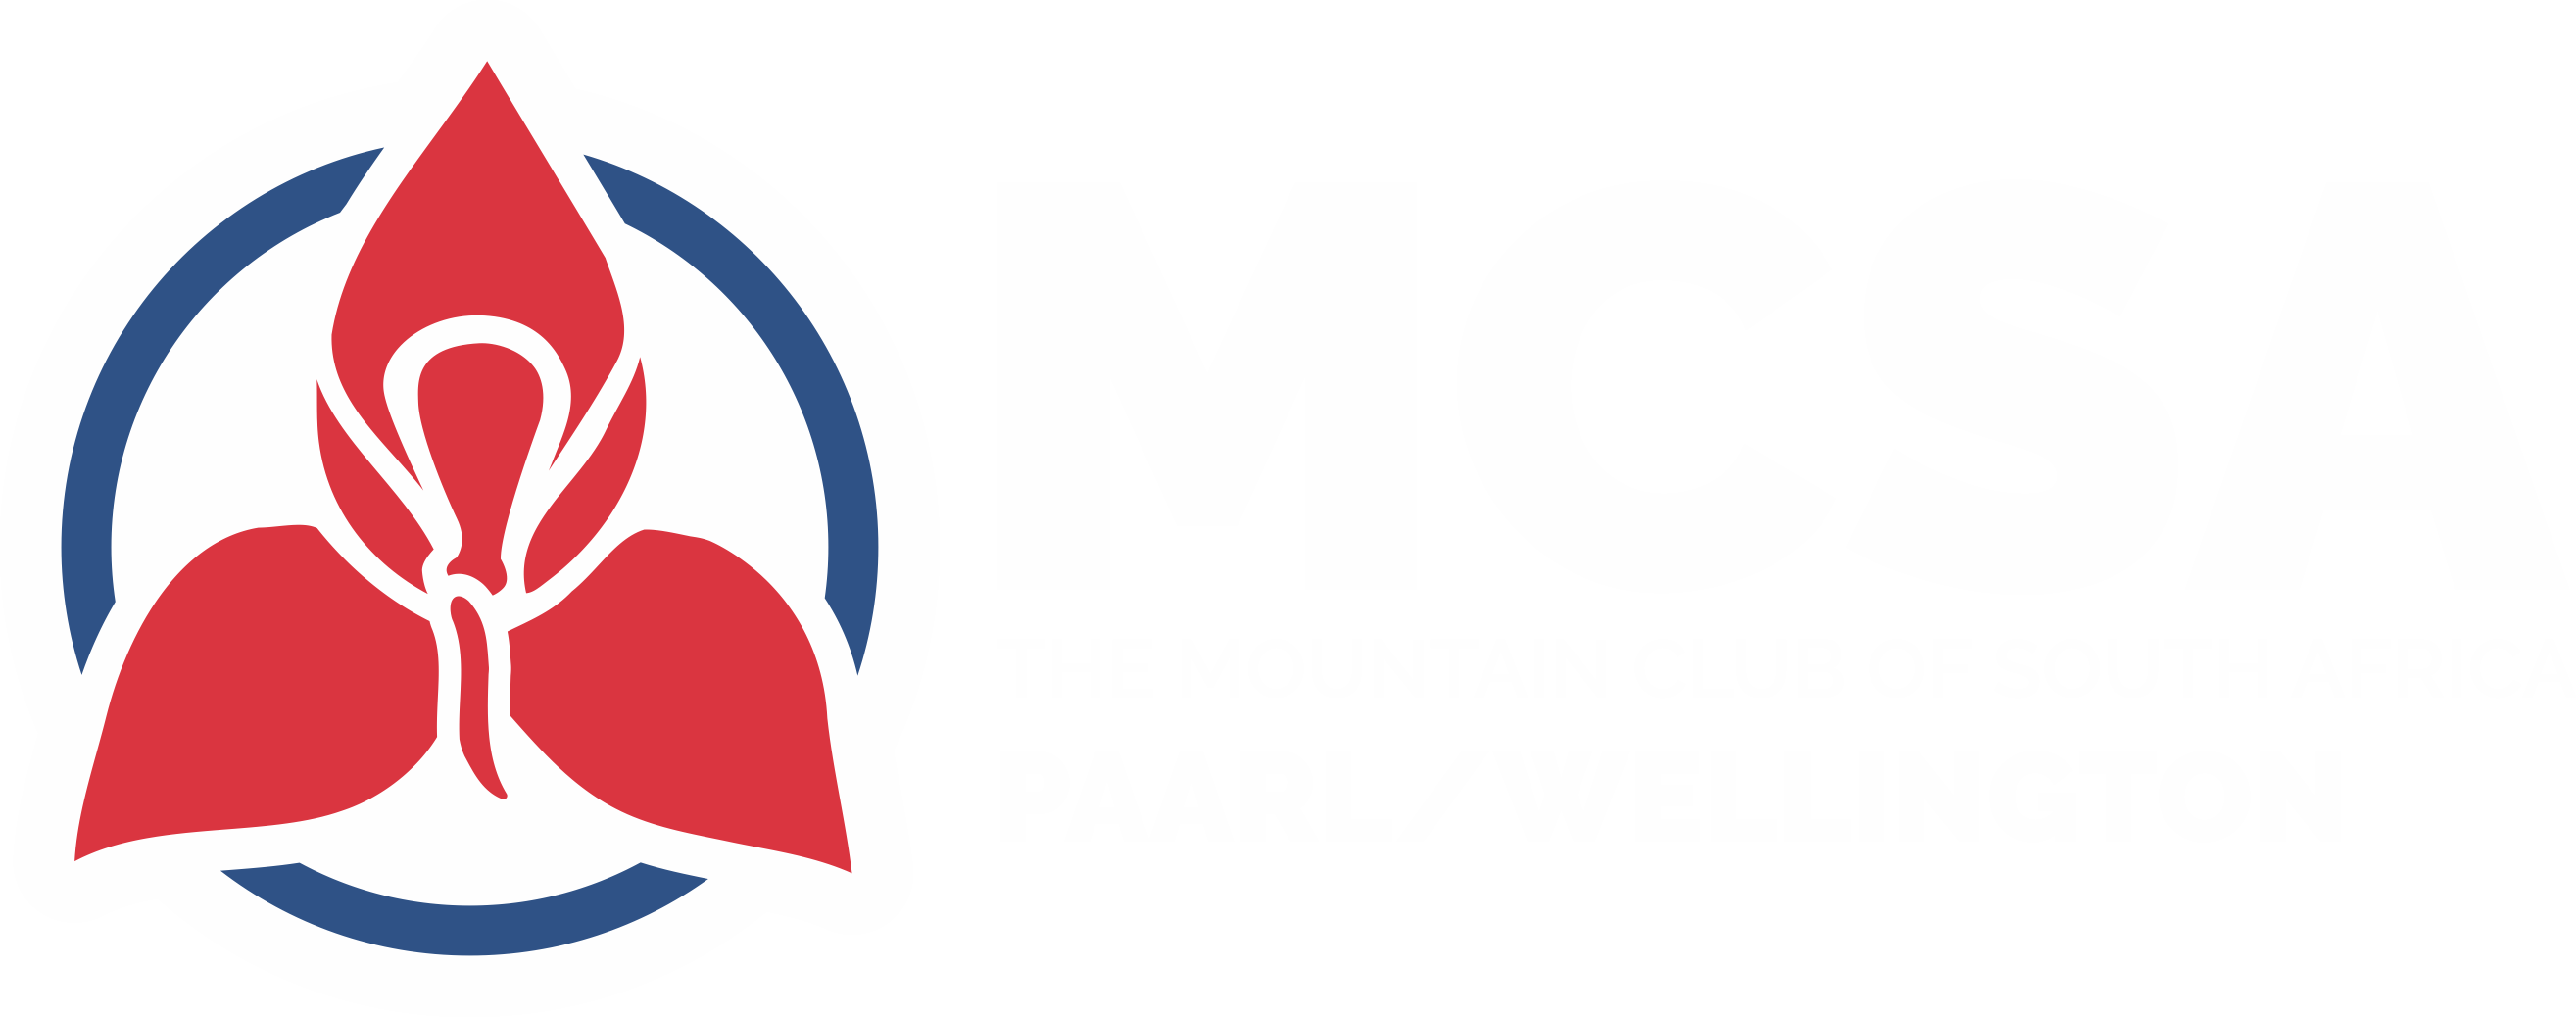 MCSA PW